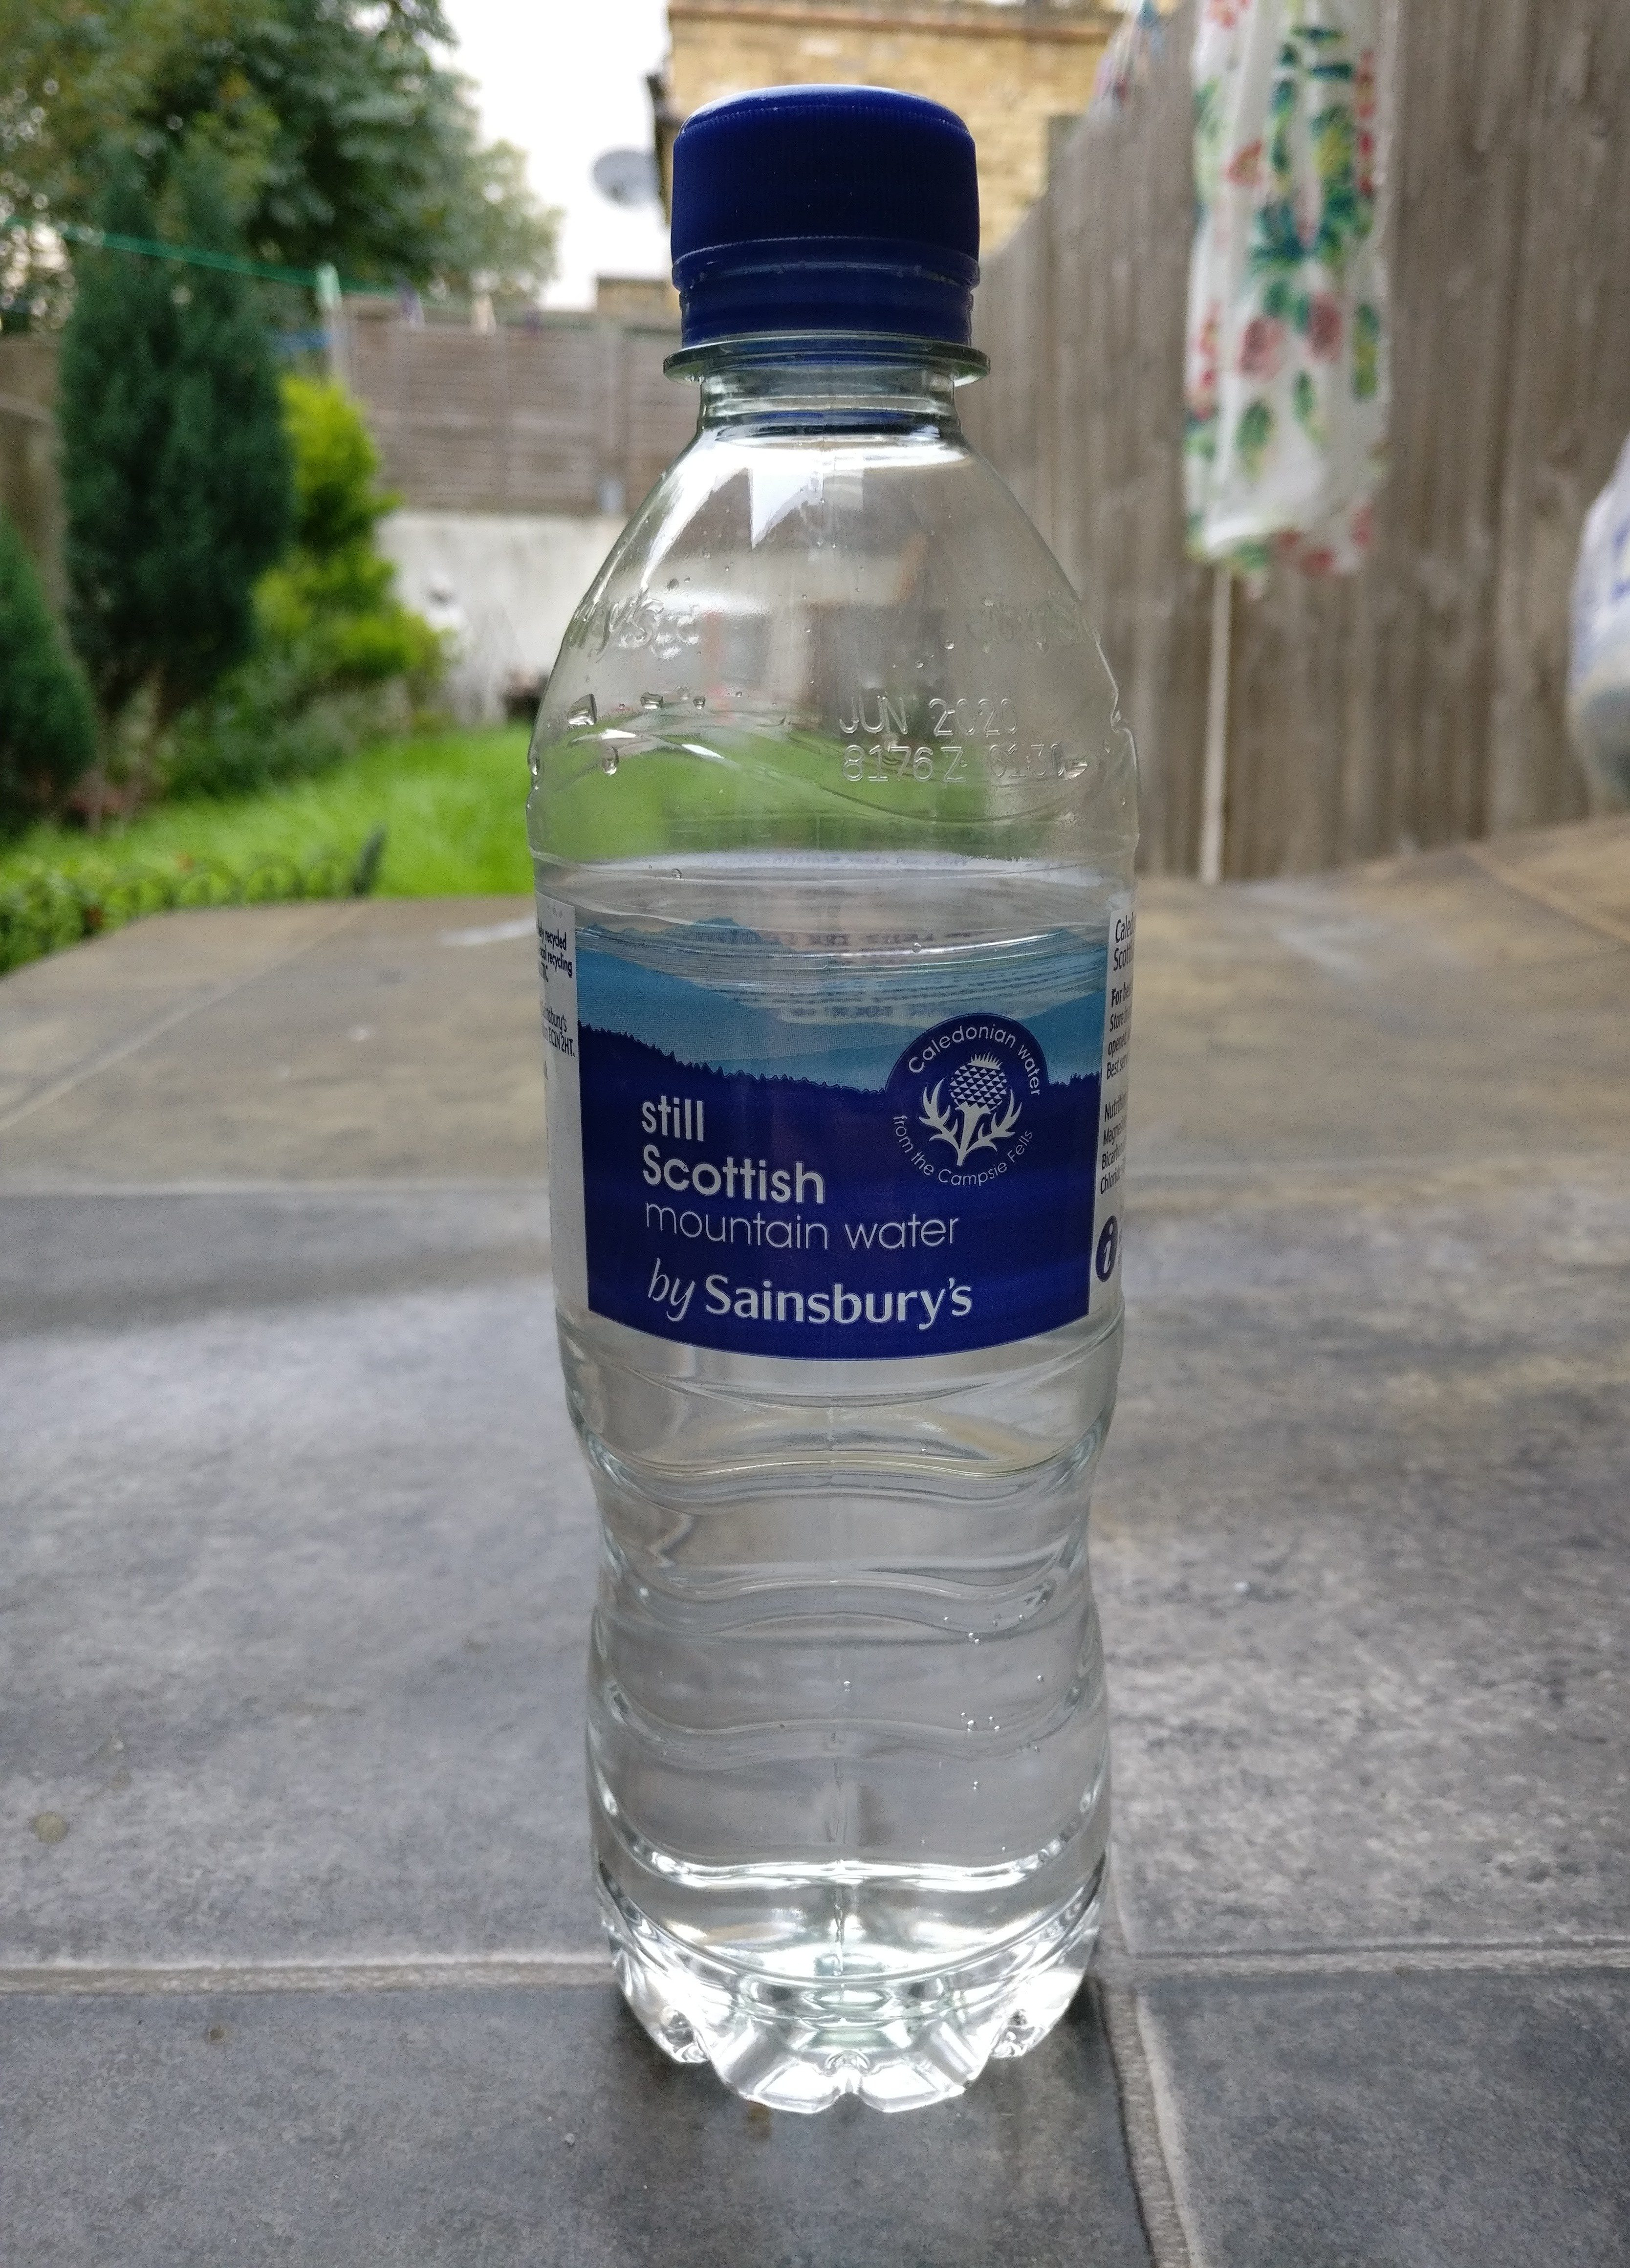 Still Scottish Mountain Water by Sainsbury's - Product - en